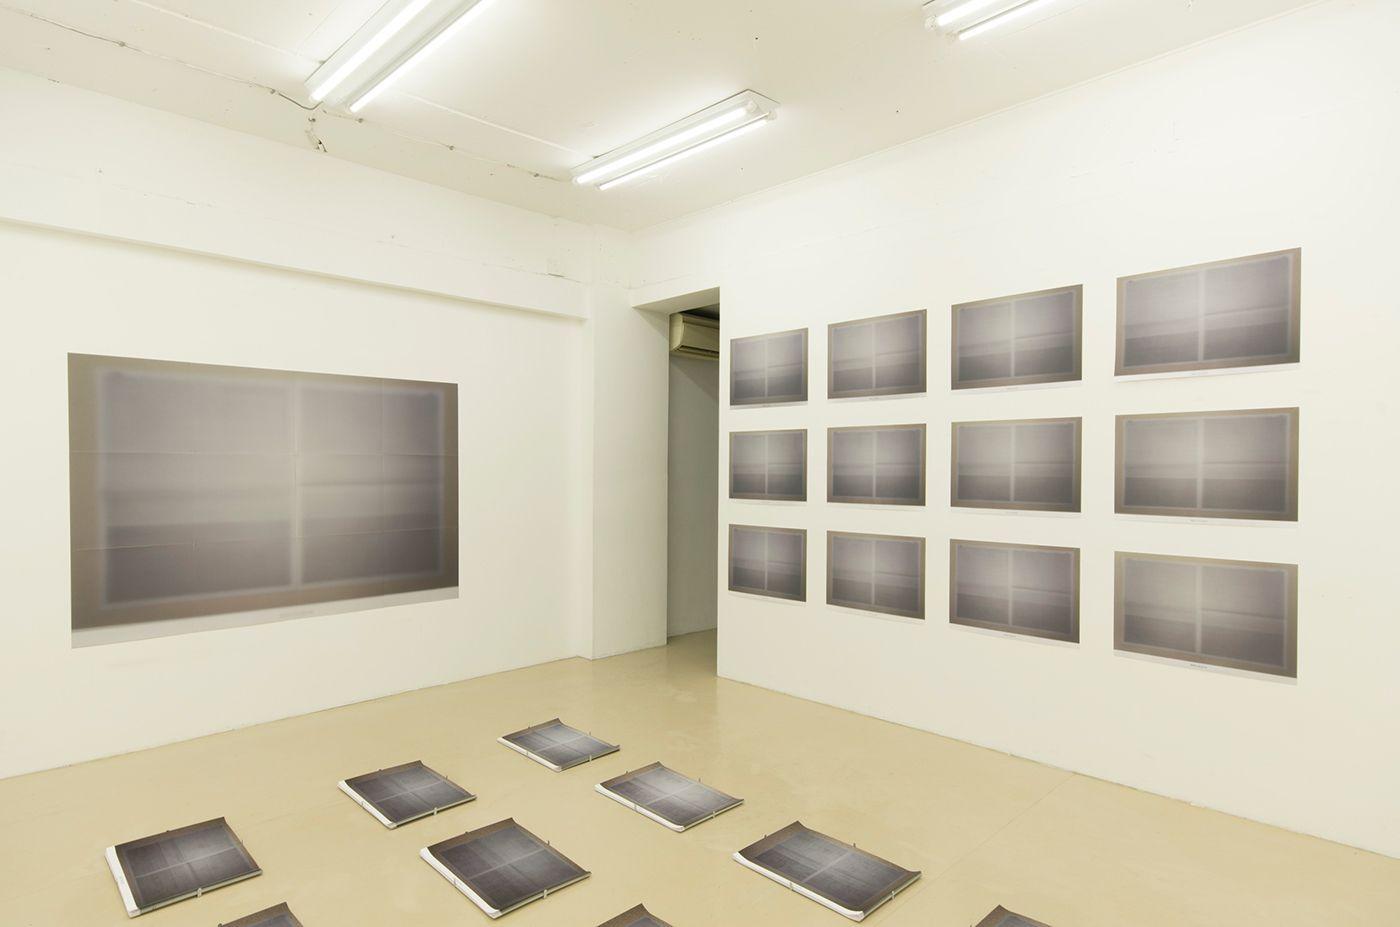 Exhibition:Post[APRIL,2015-MARCH,2016]